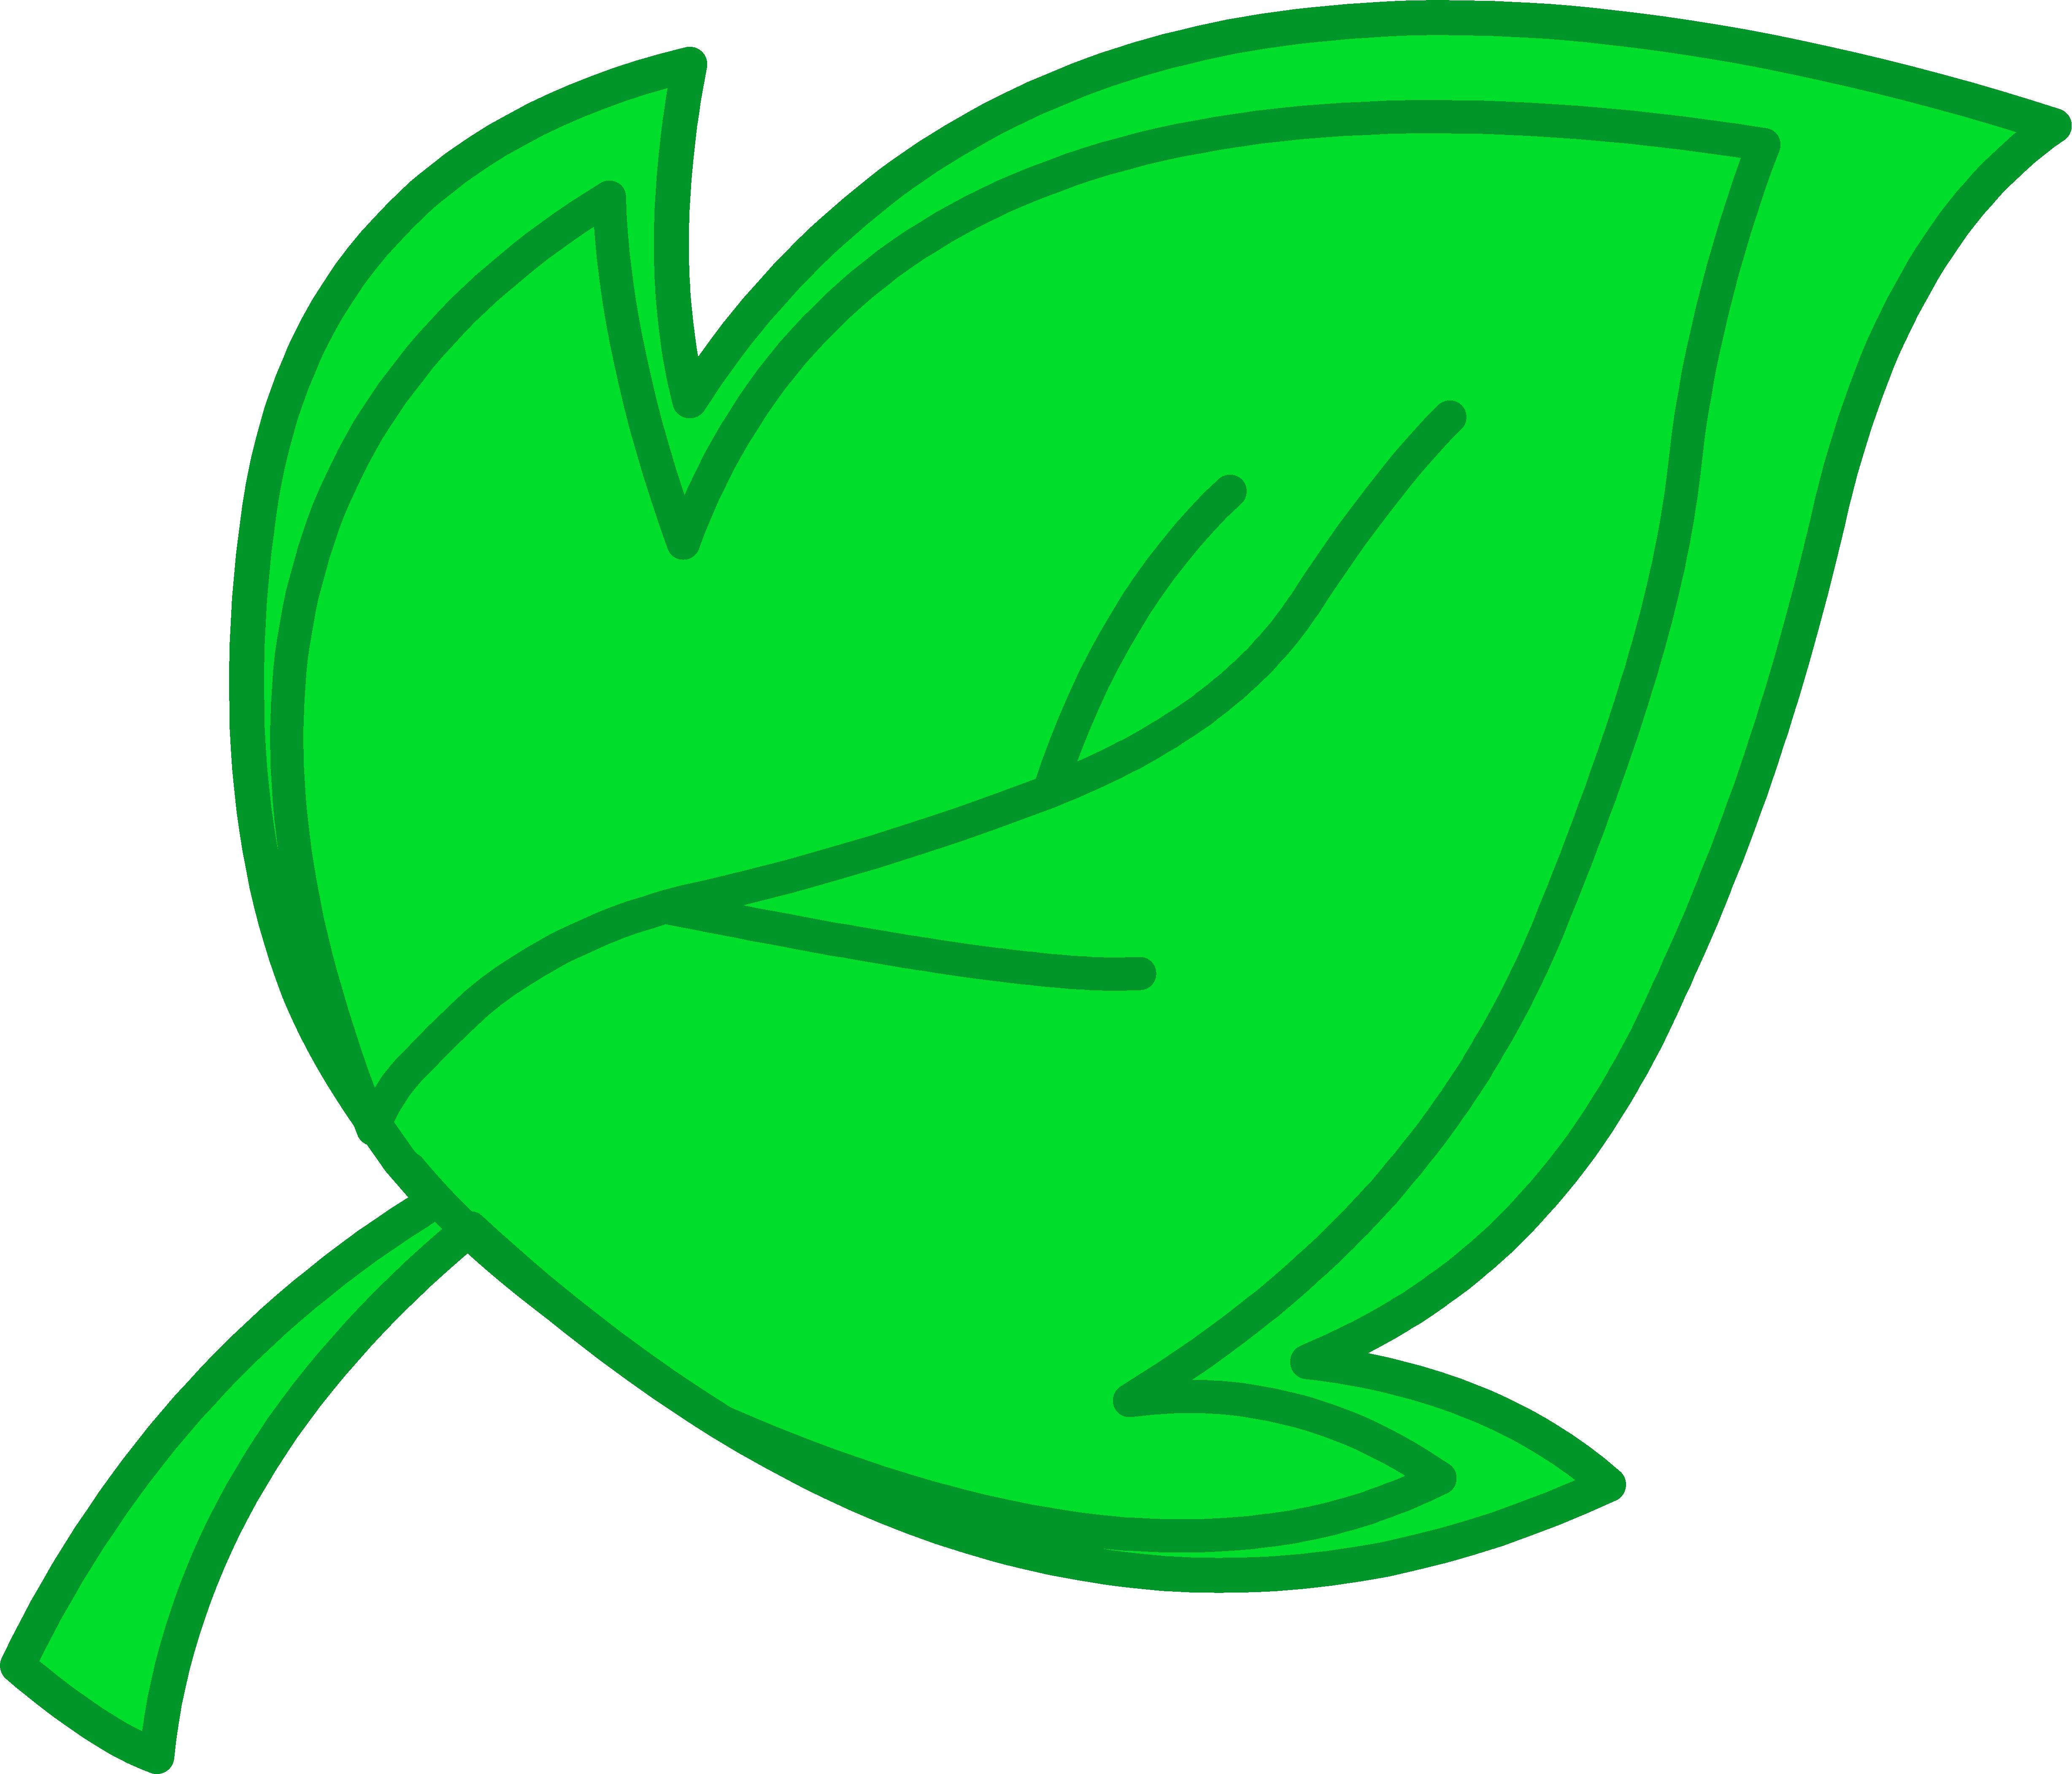 Leaf clipart dromgcb top.